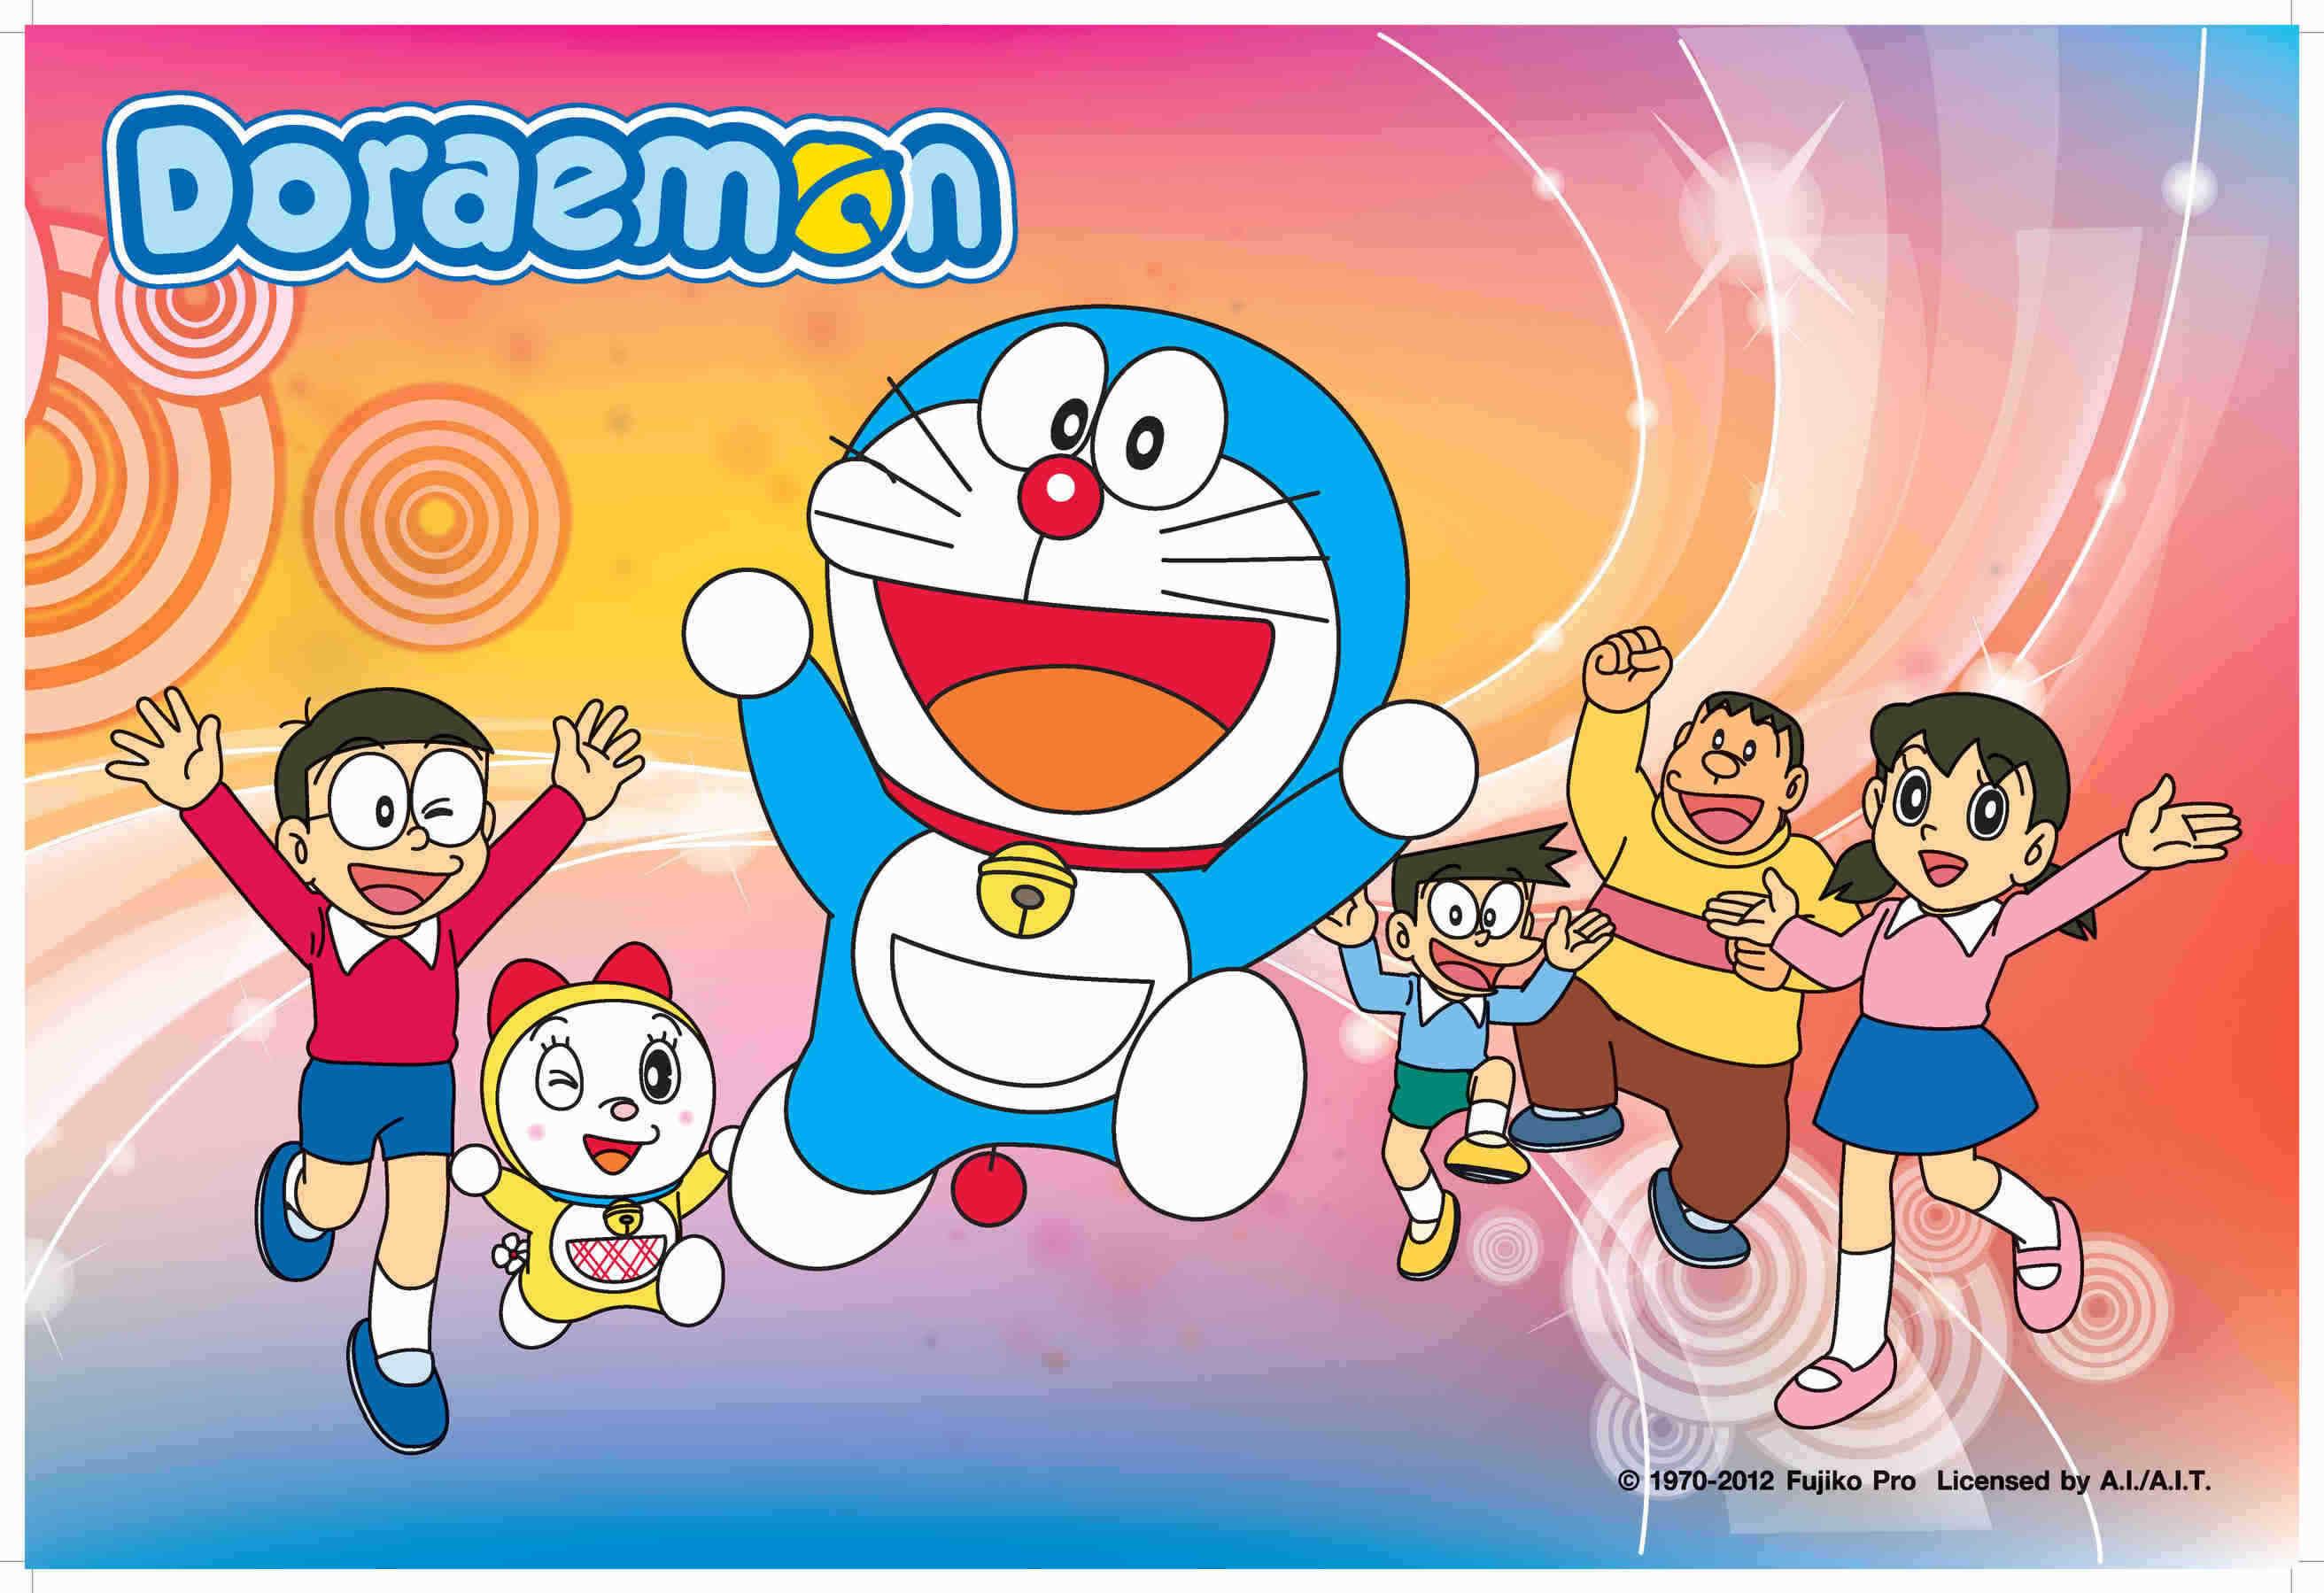 Doraemon 2011 5